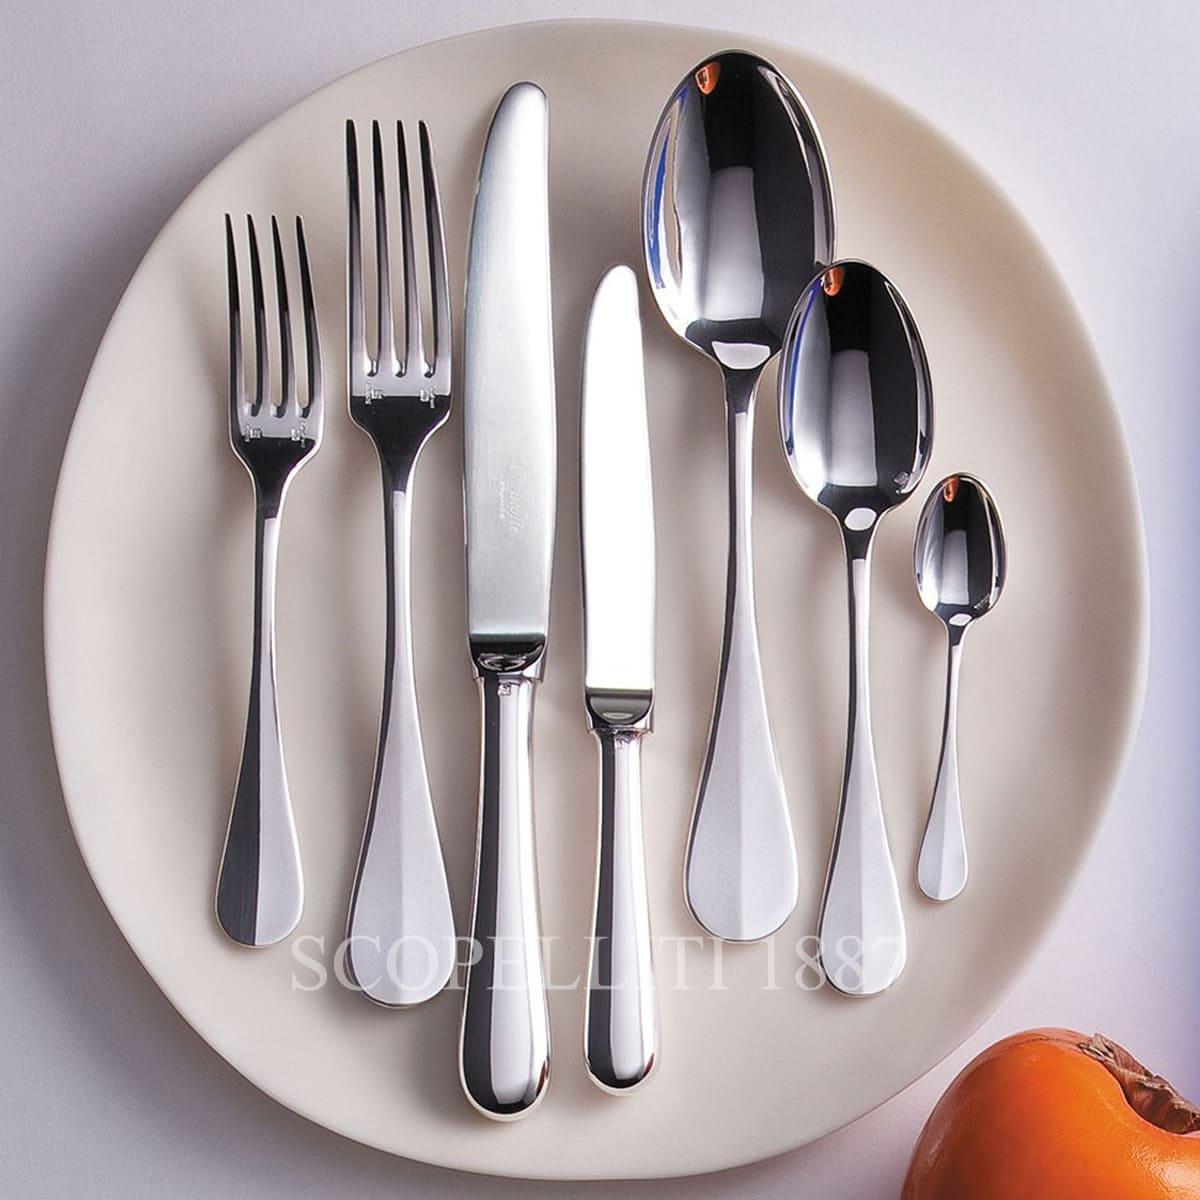 christofle fidelio flatware silver plated